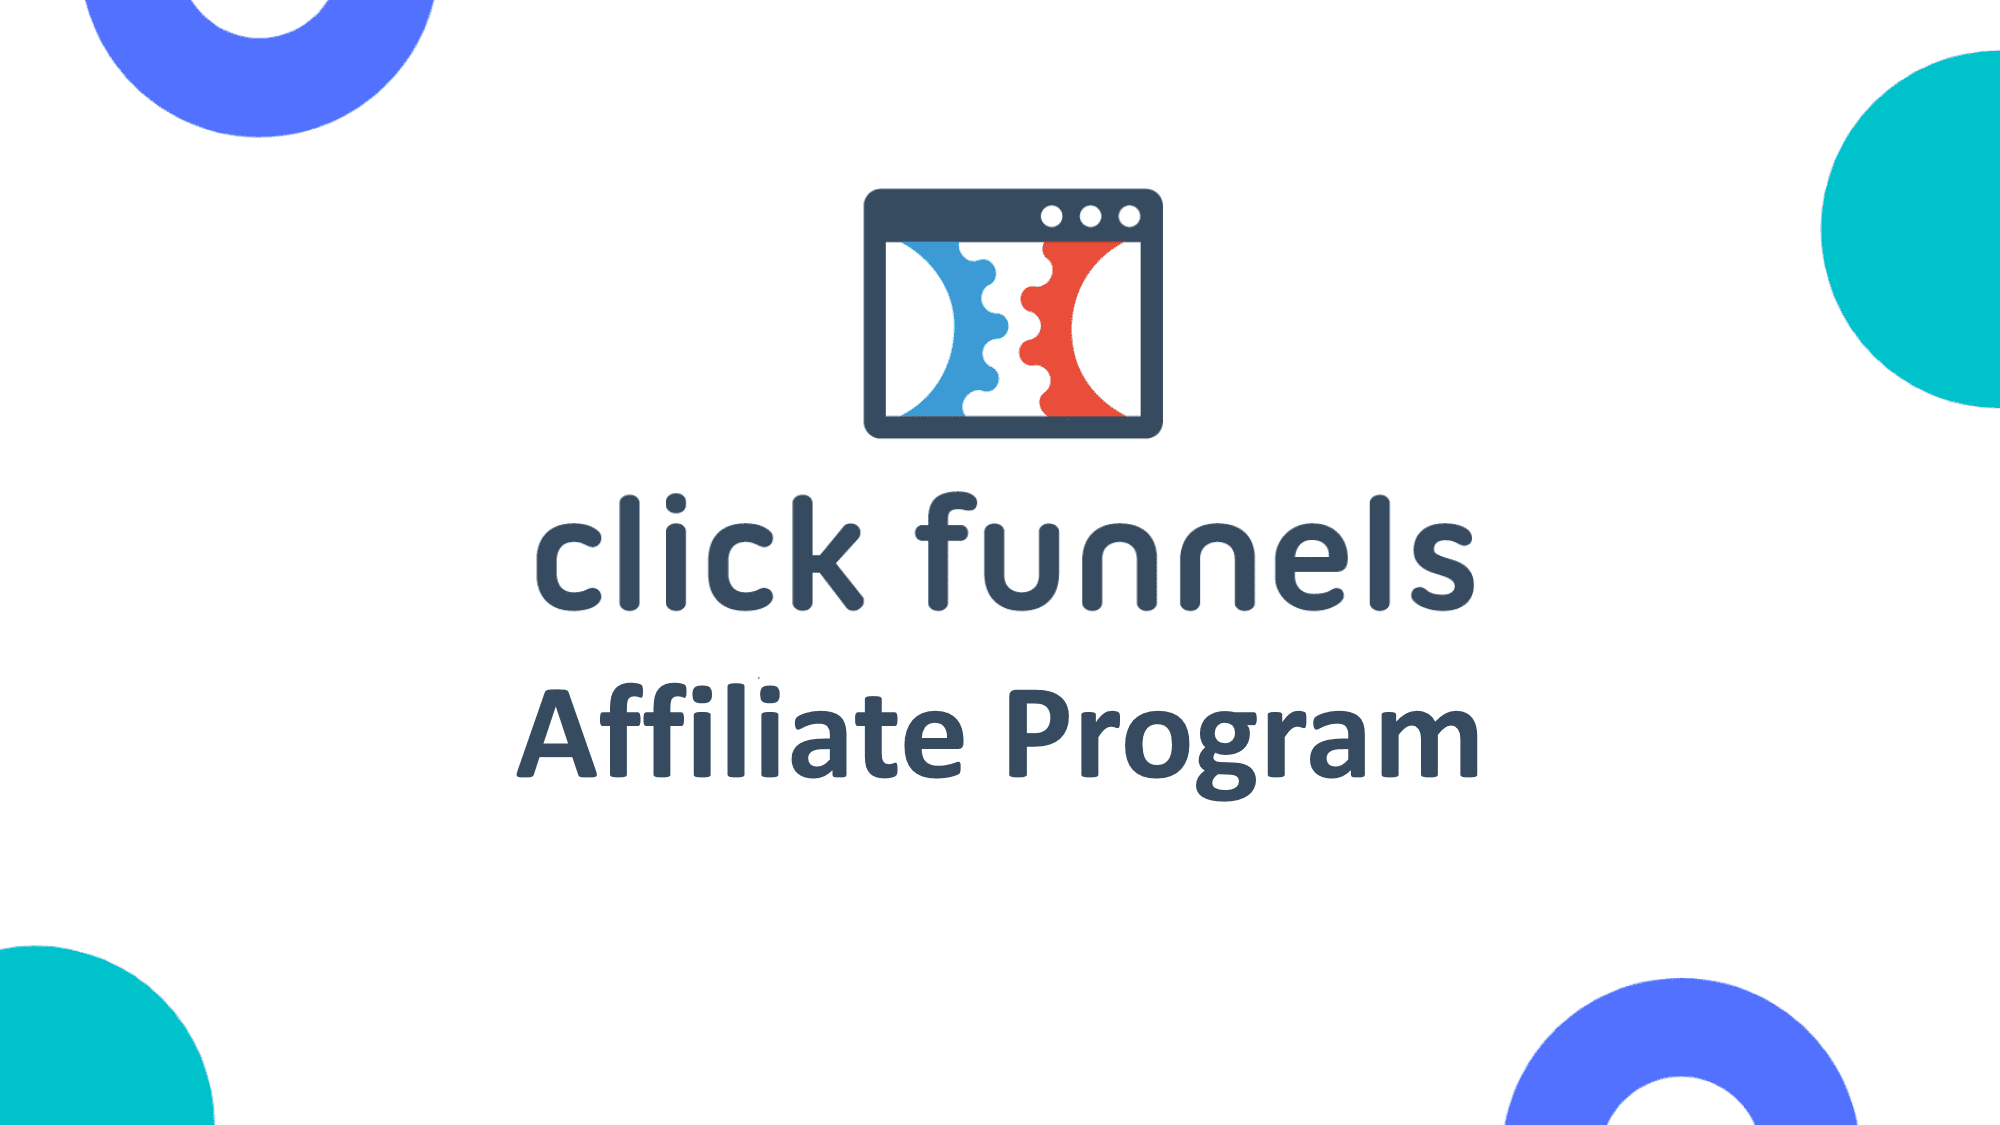 Clickfunnels Affiliate Program: How Does It Work?